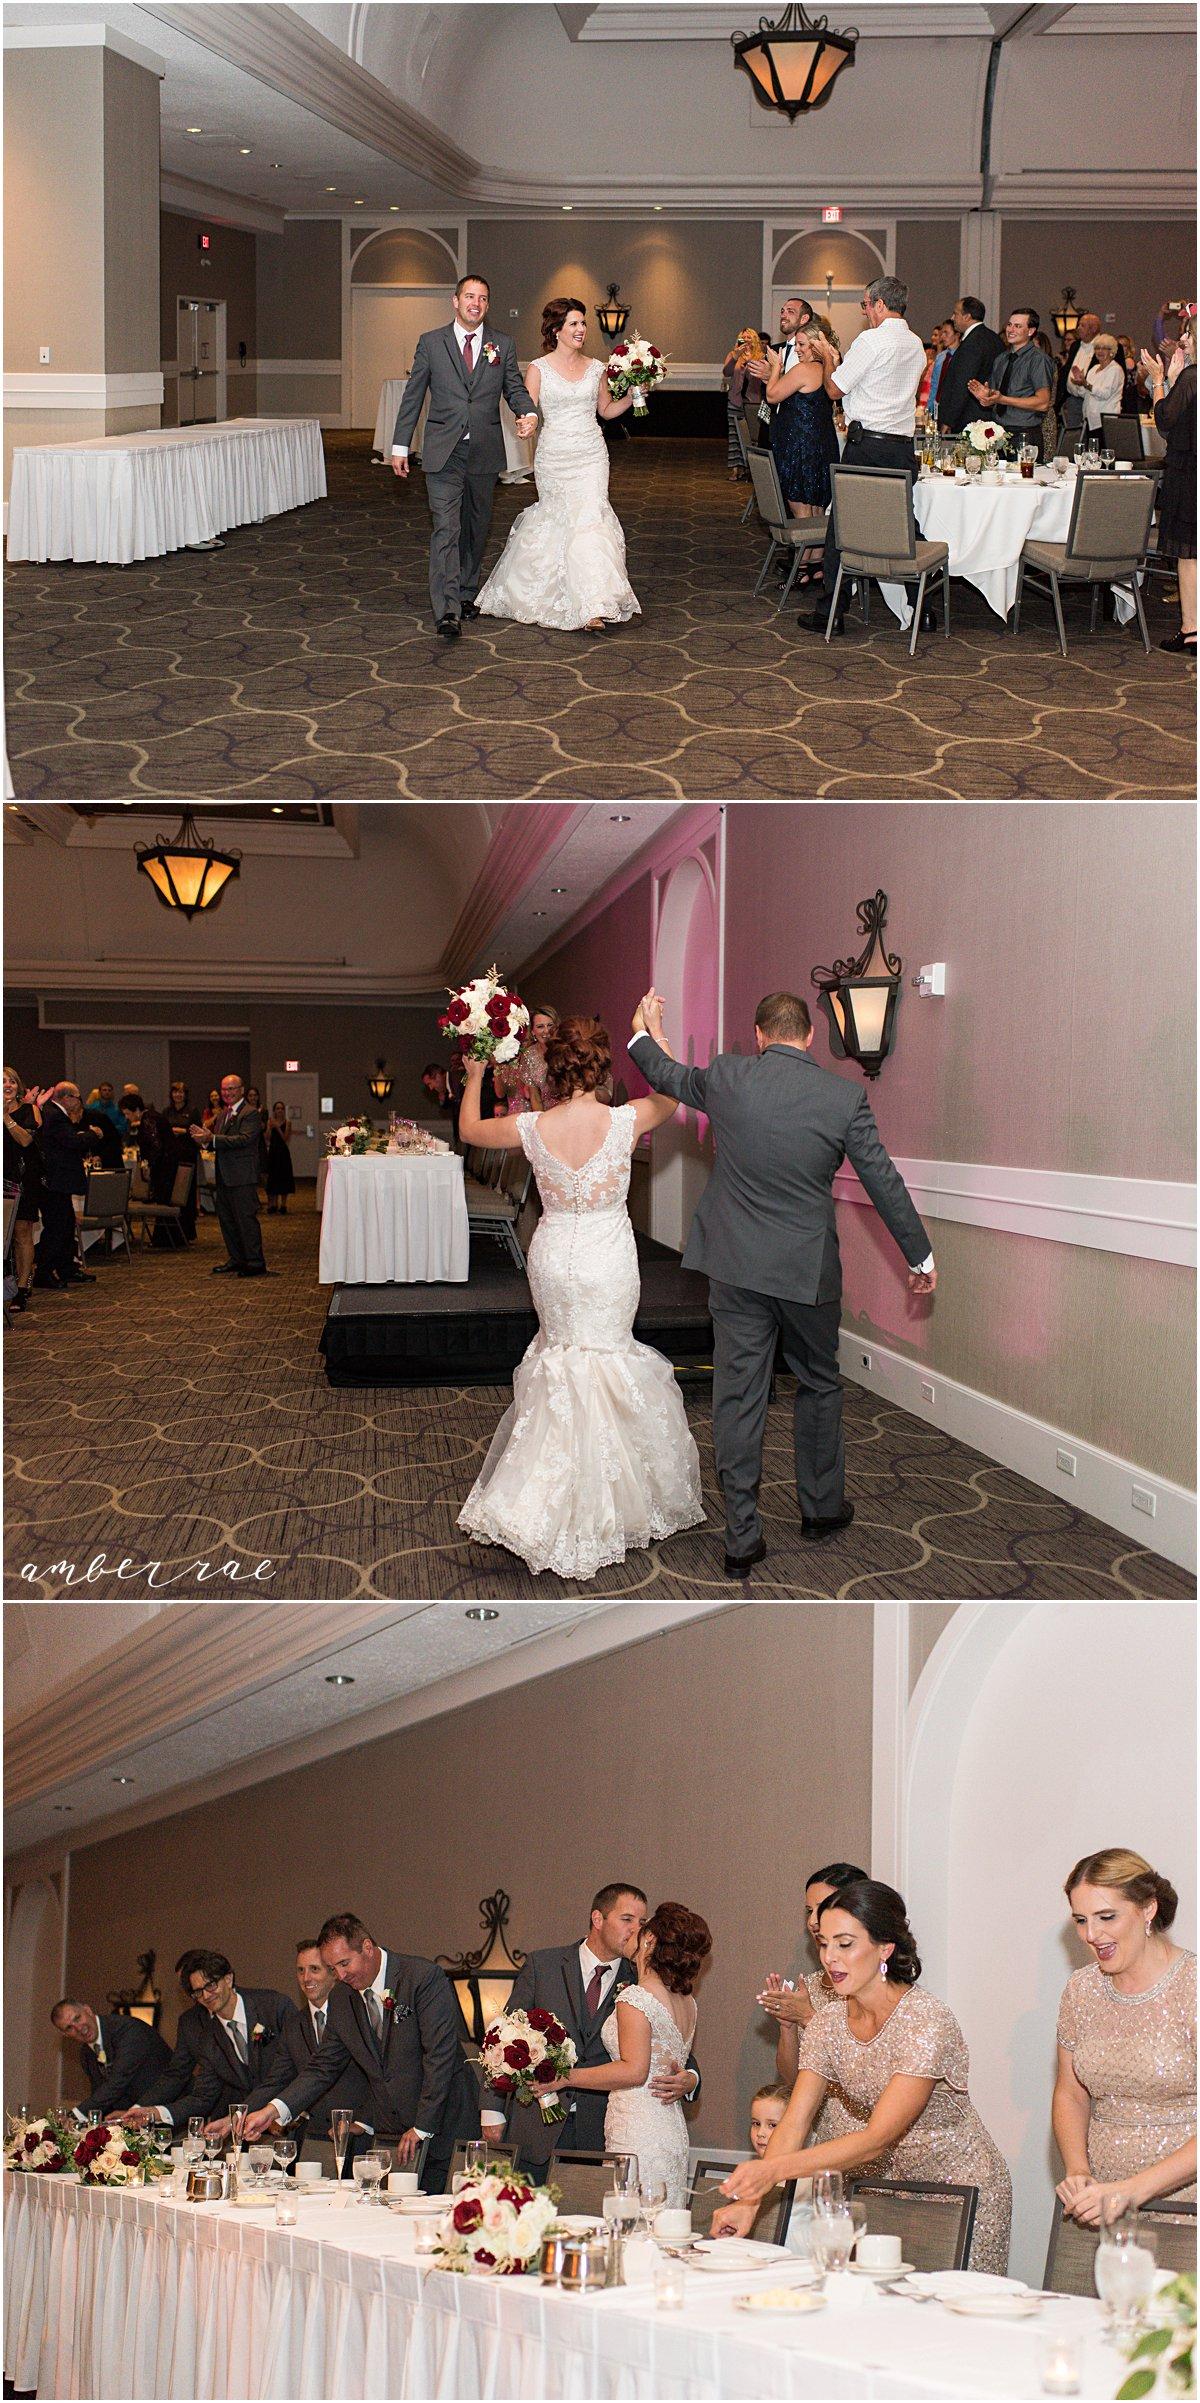 Gustafson Wedding 2018_0025.jpg